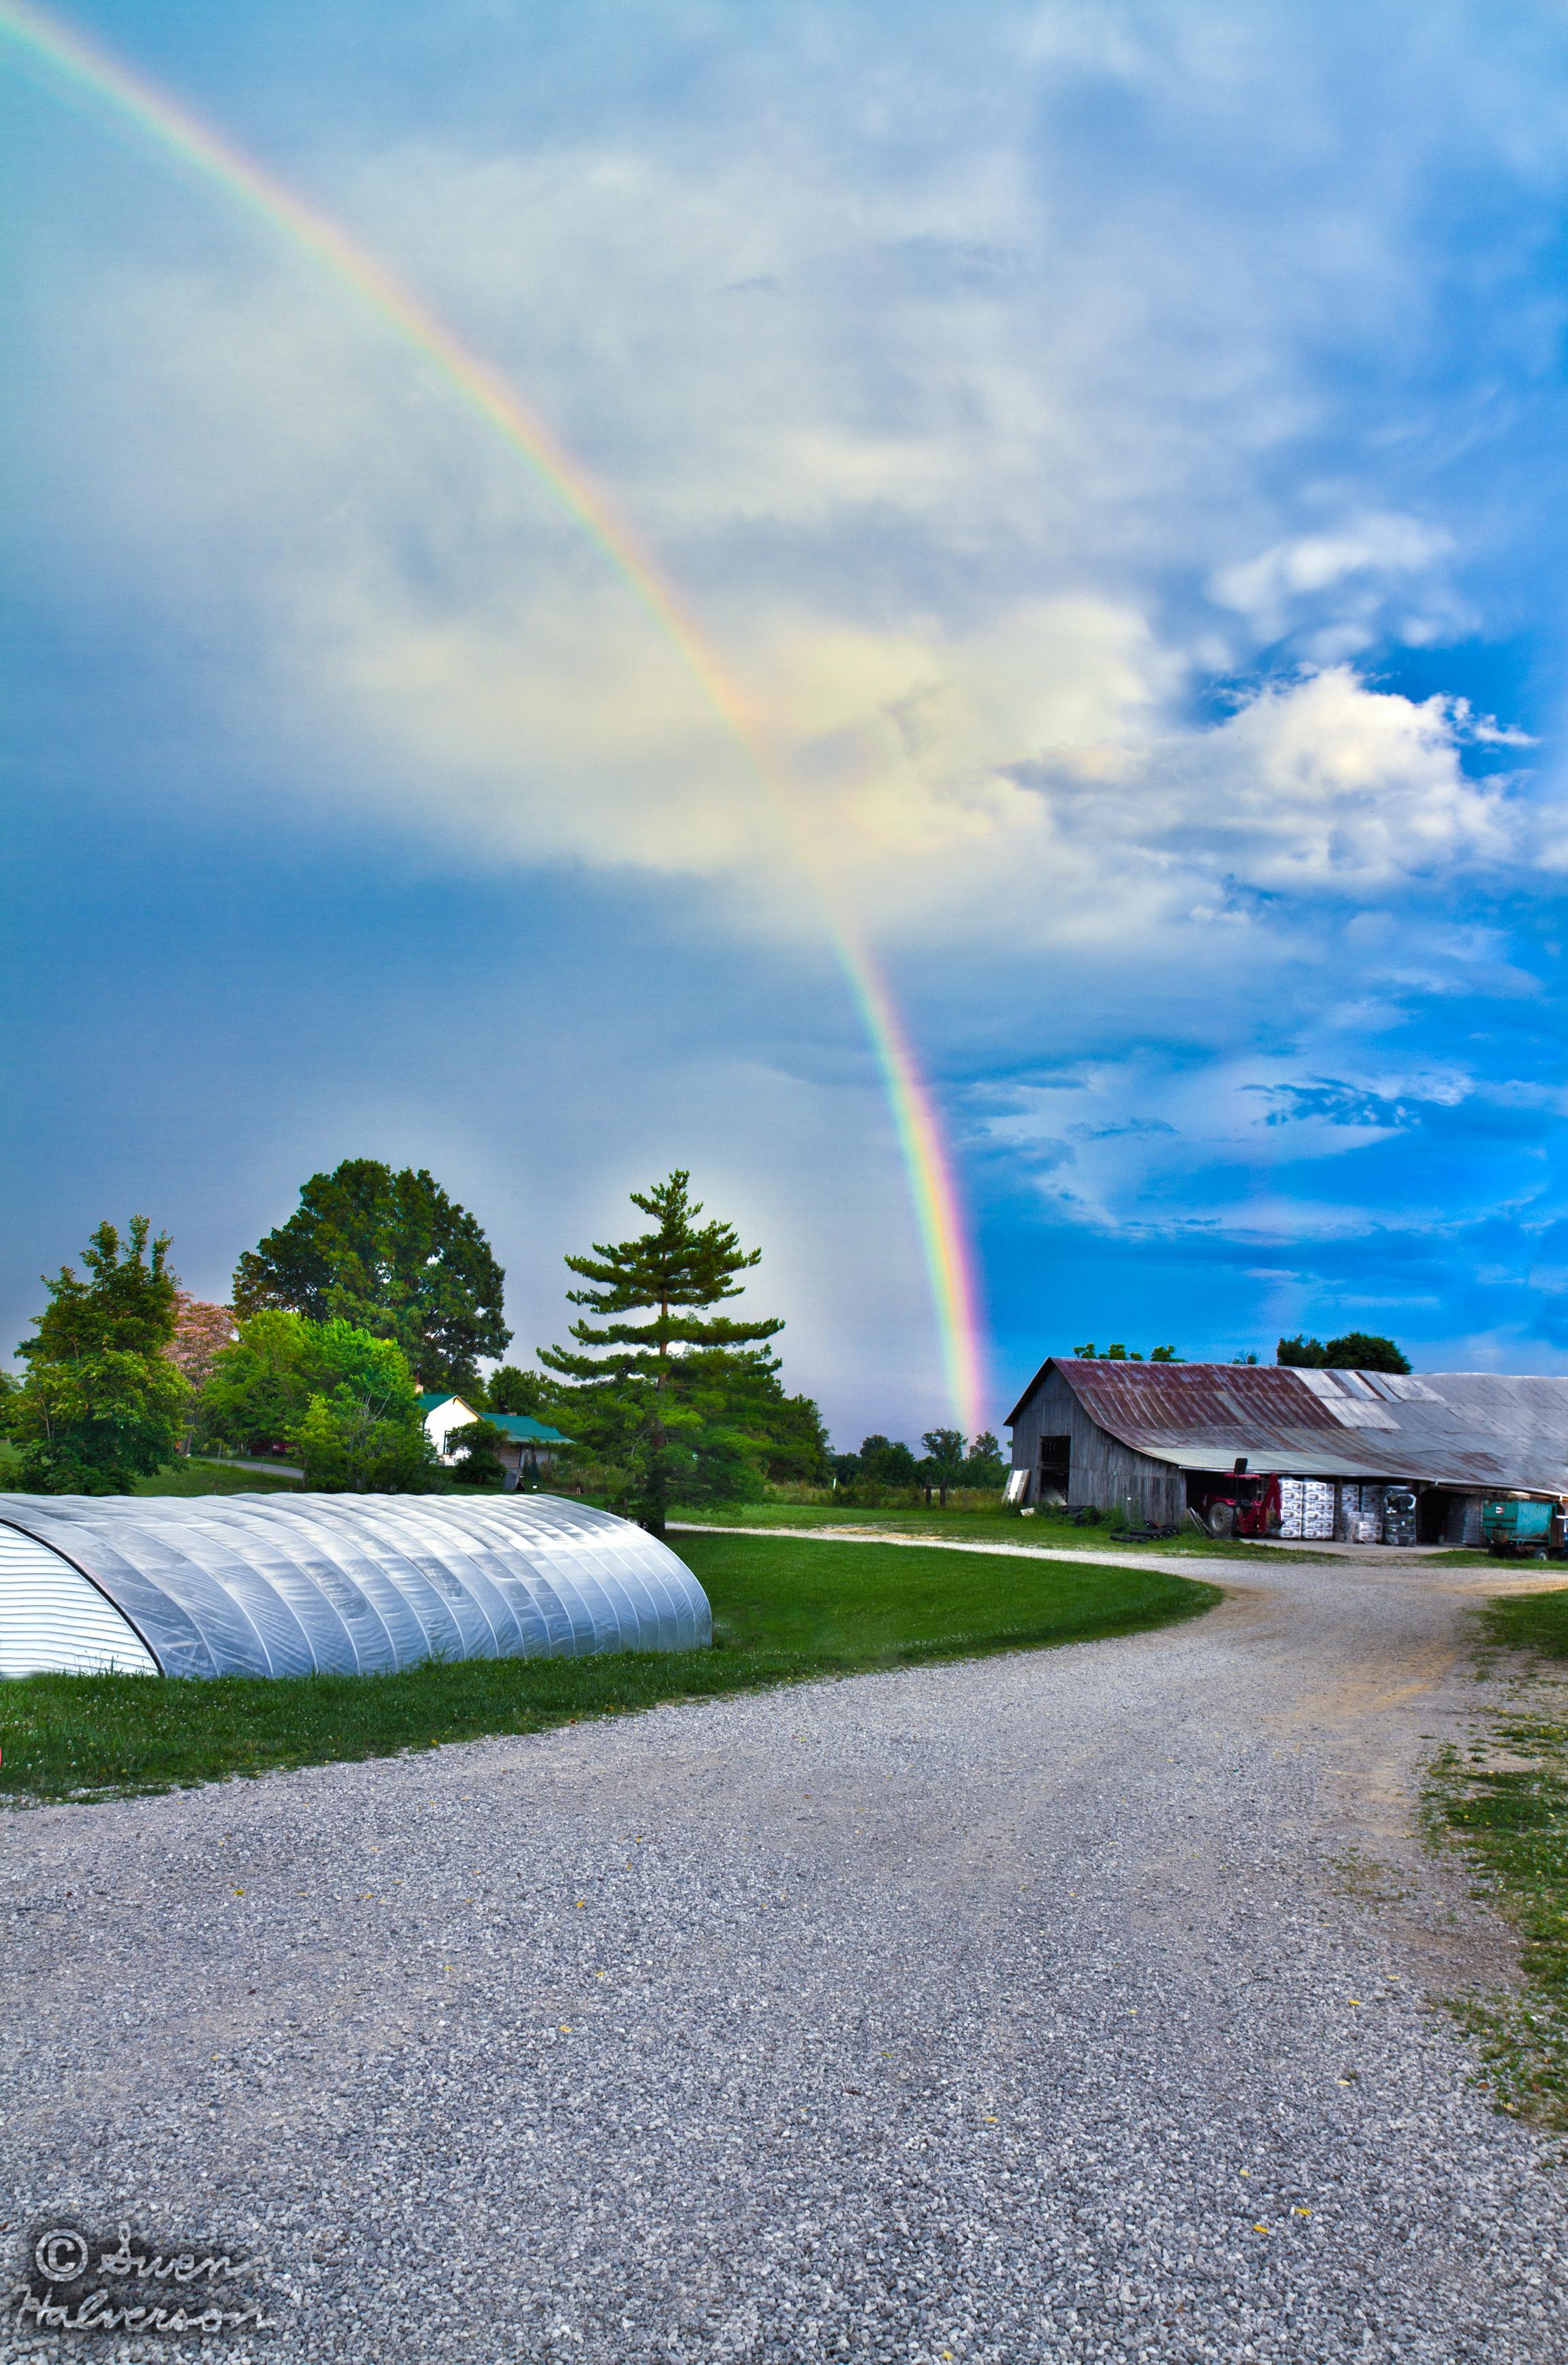 Theme: Under <br>Title: Under The Rainbow